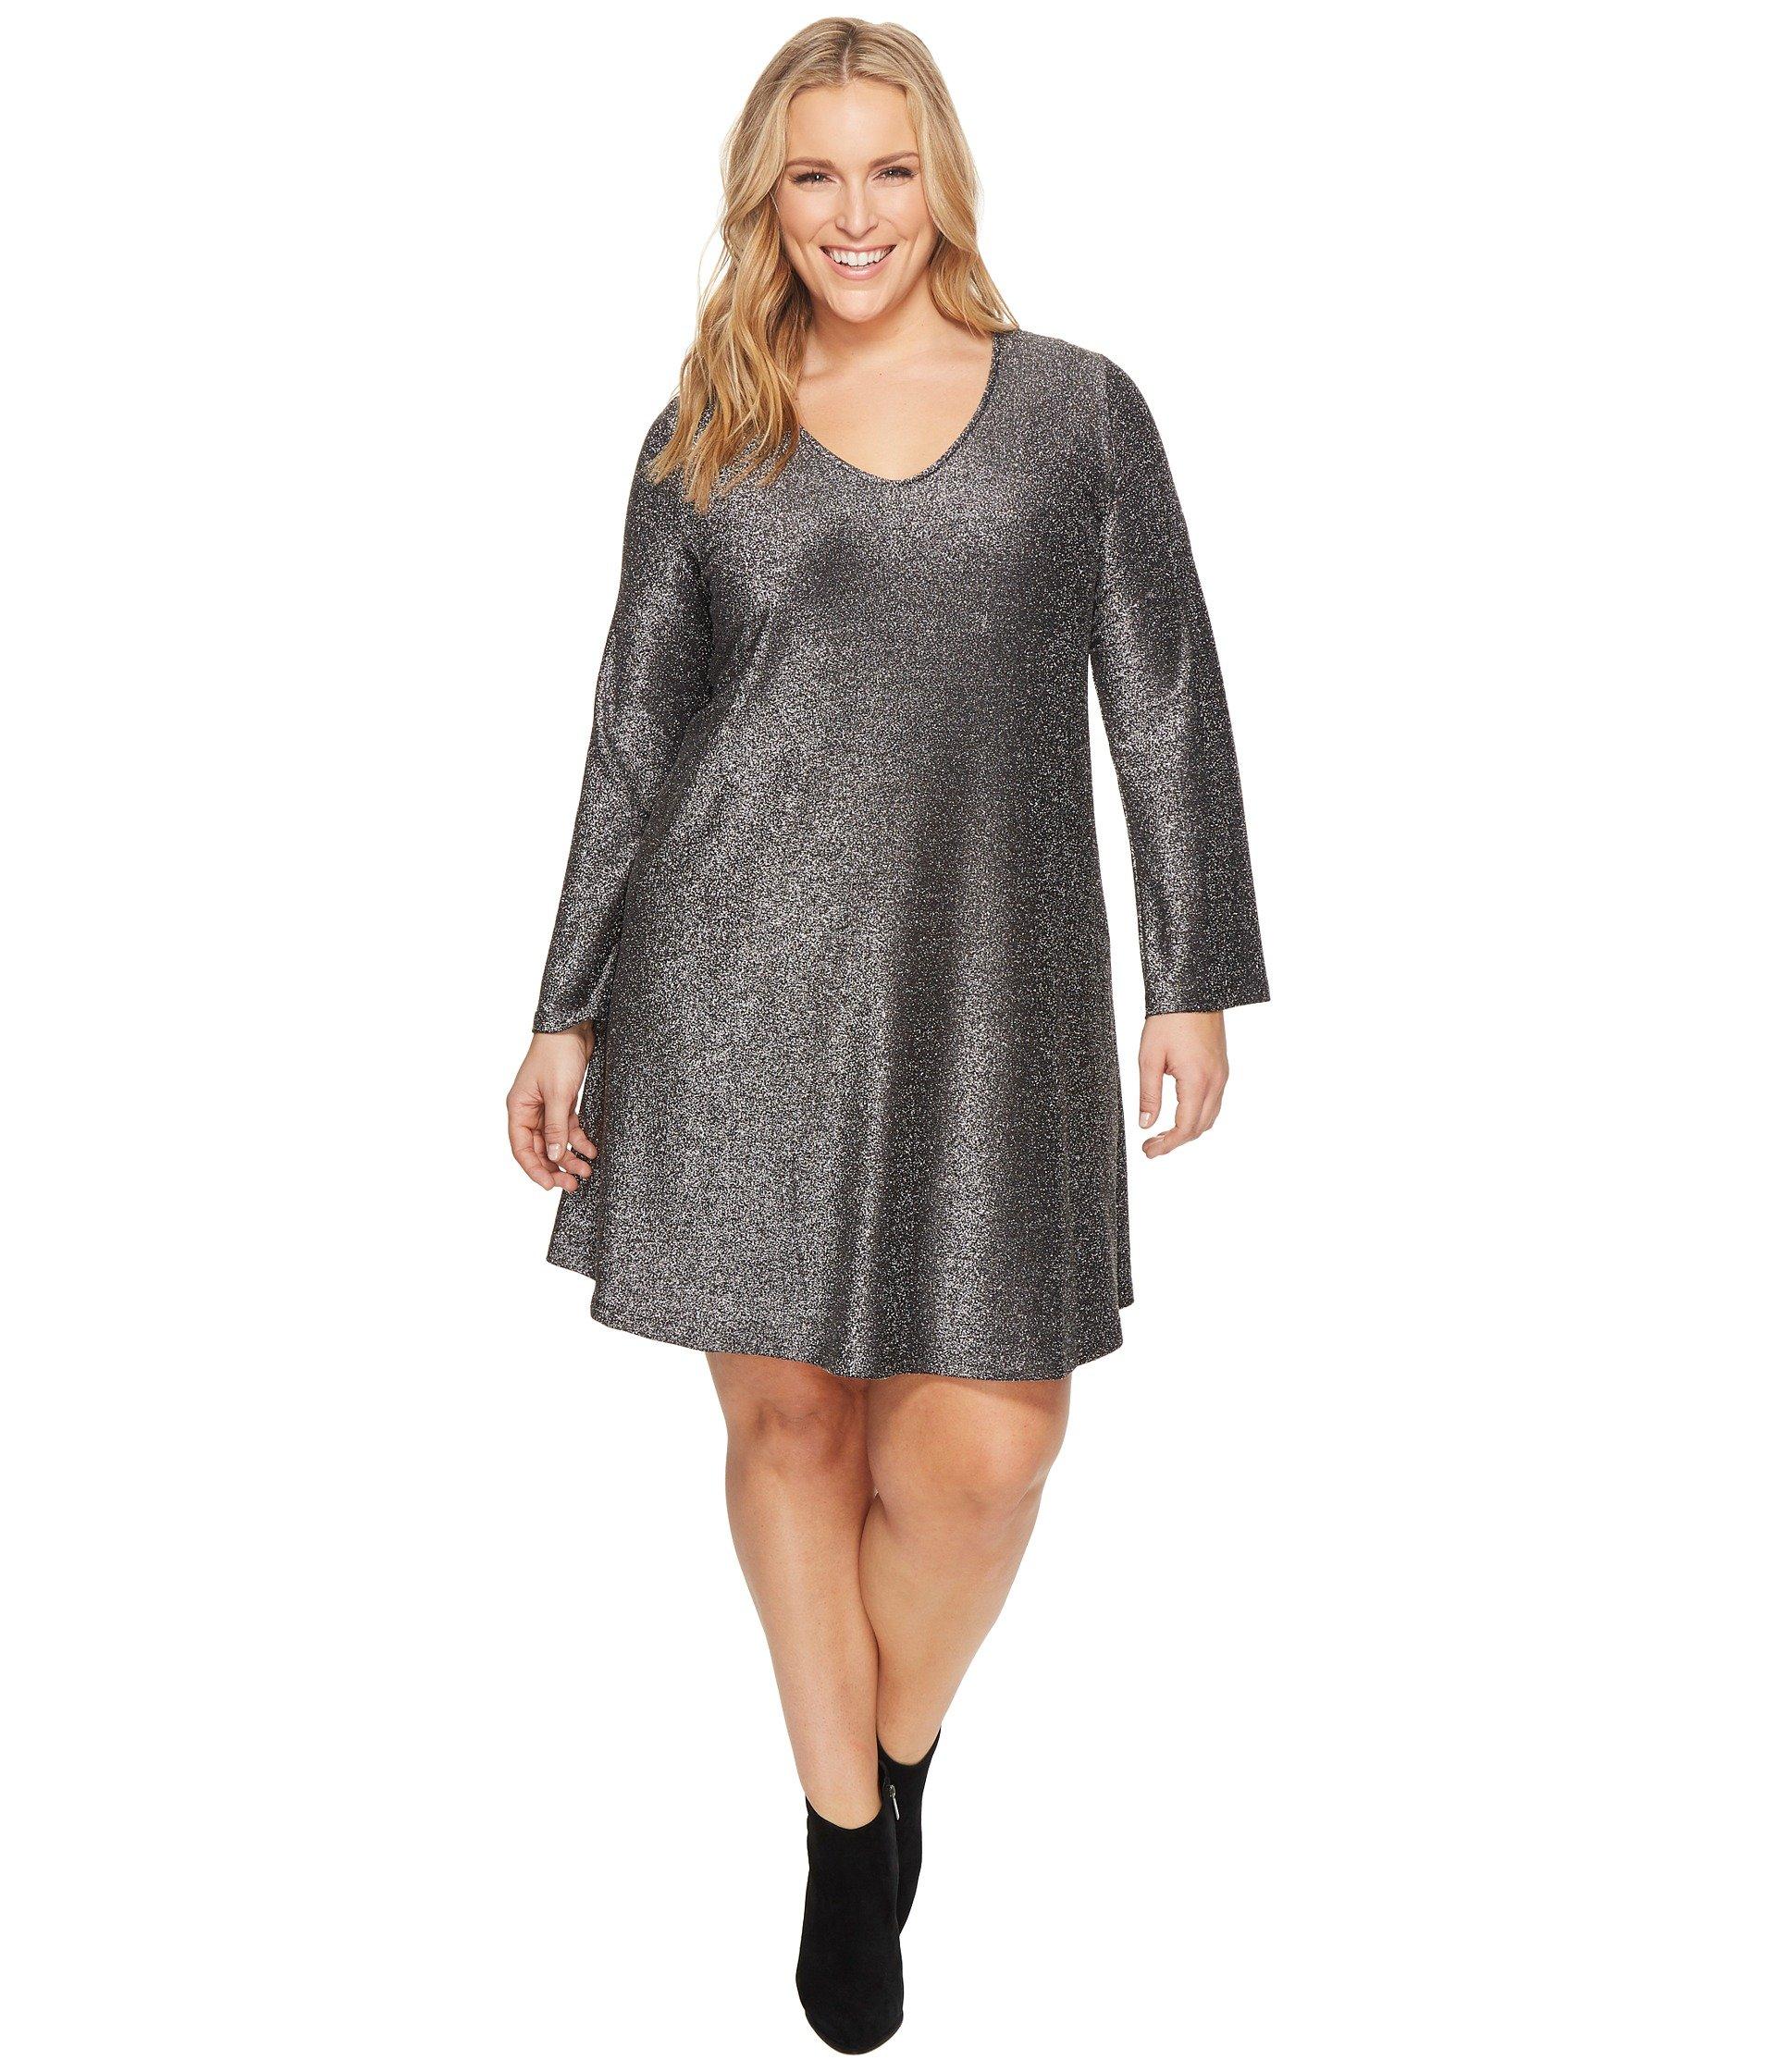 Karen Kane Women's Plus Size Sparkle Taylor Dress, Black With Silver, 2X